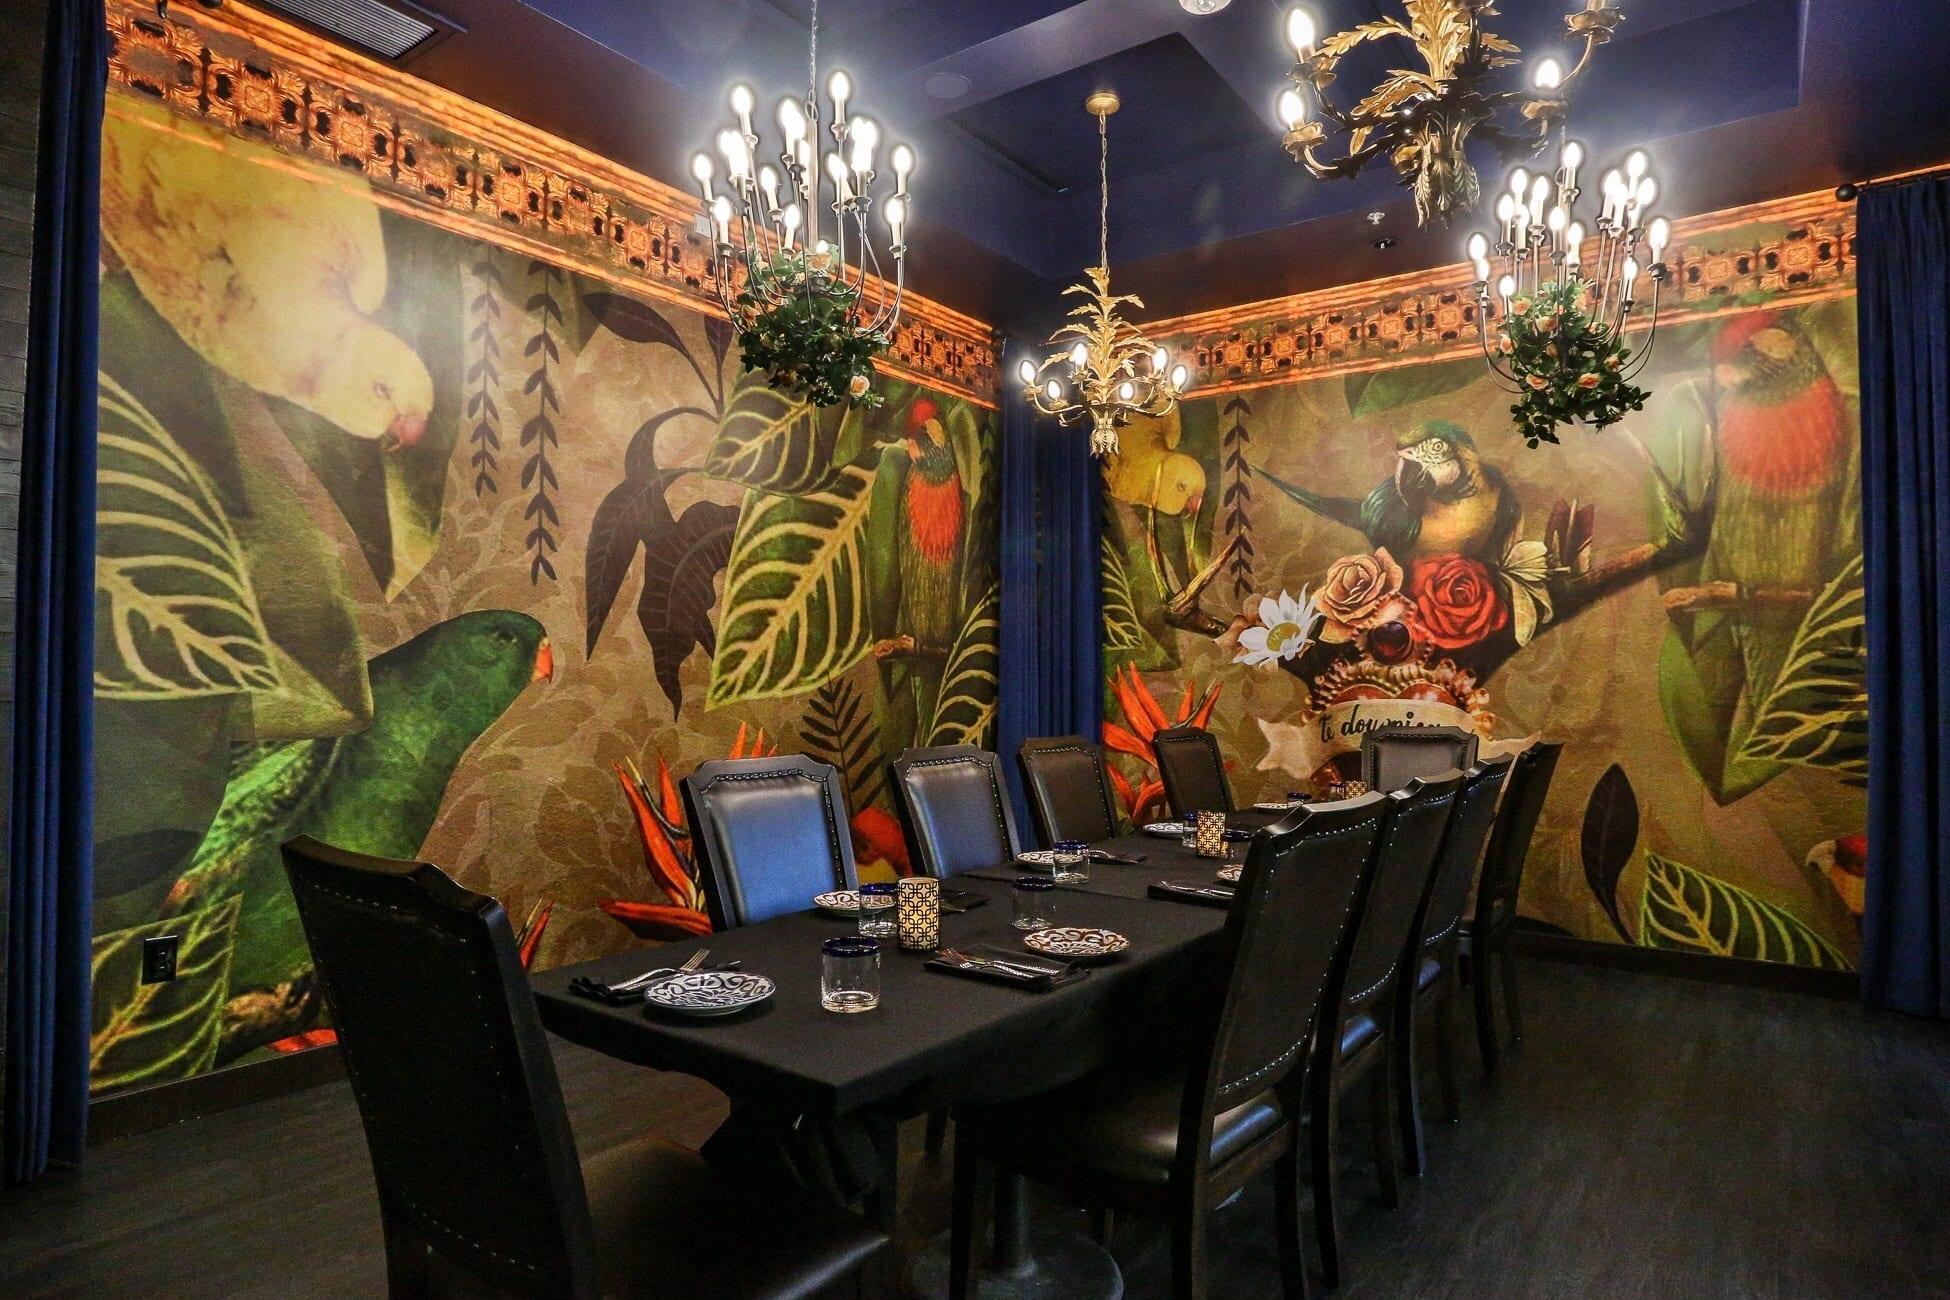 El Dorado Cantina at Tivoli Village